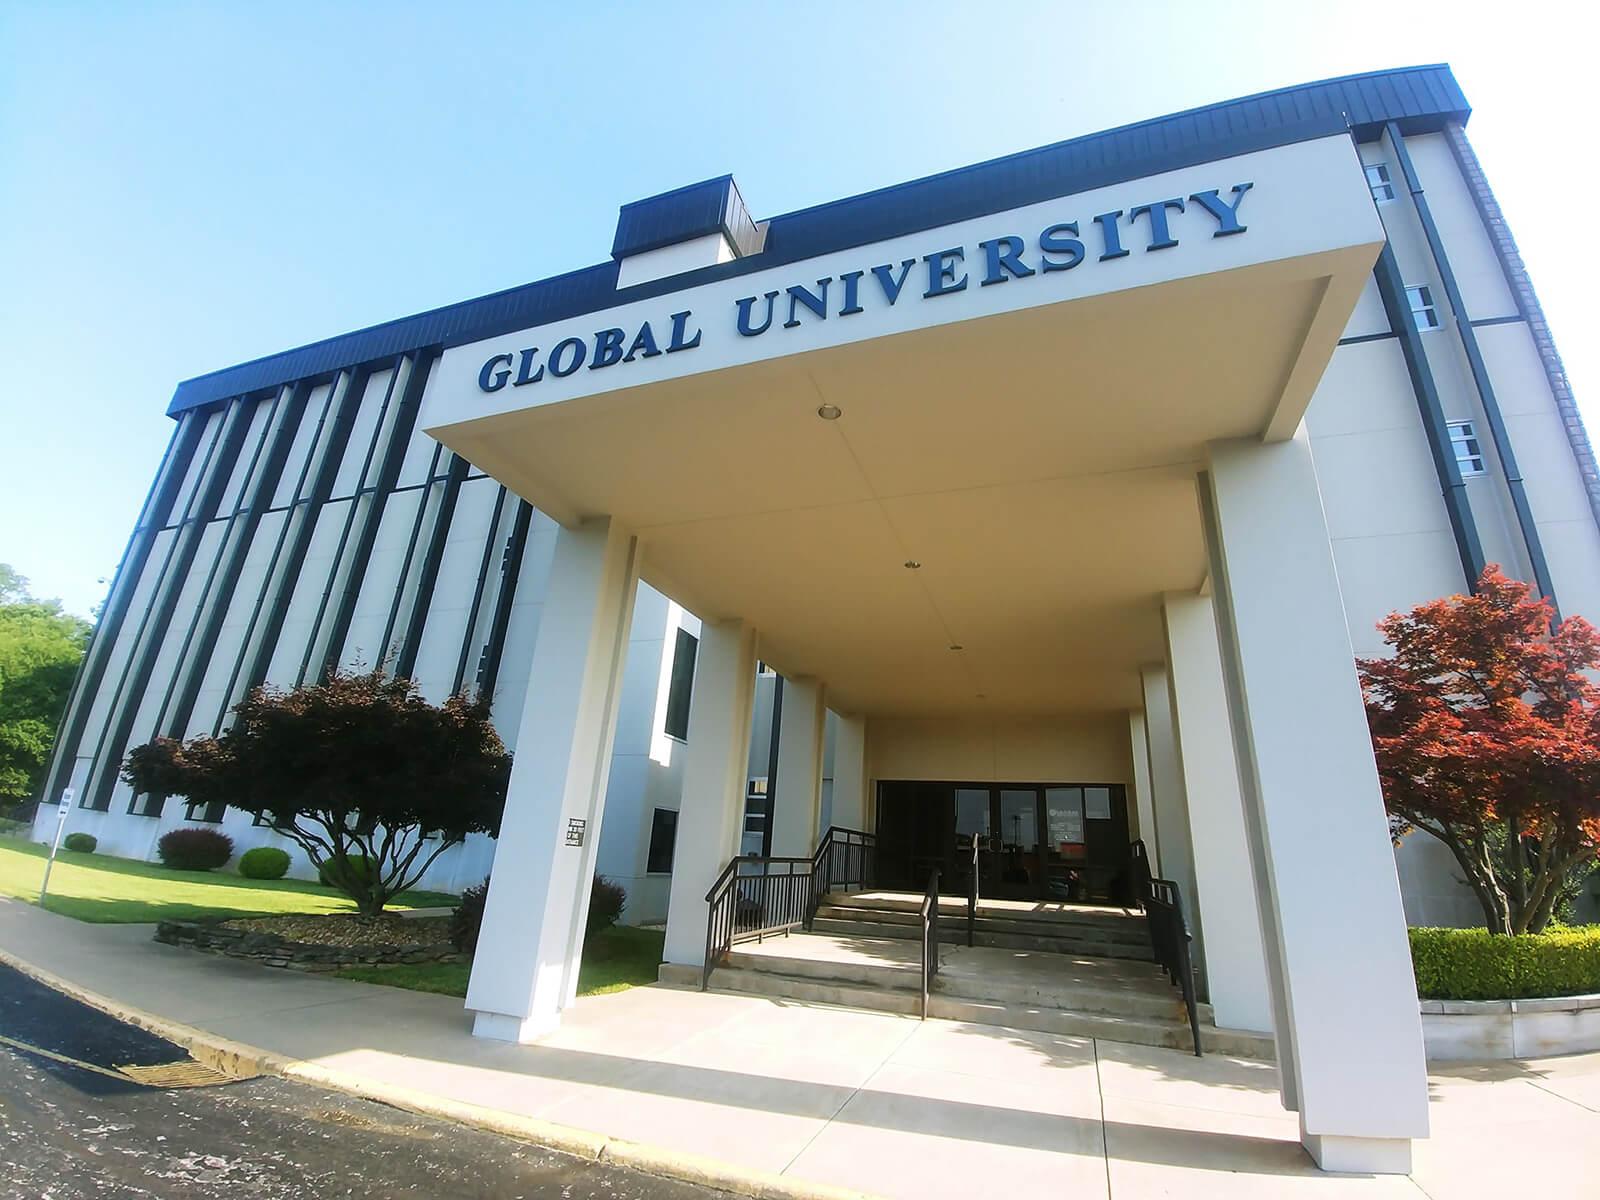 Global University International Headquarters